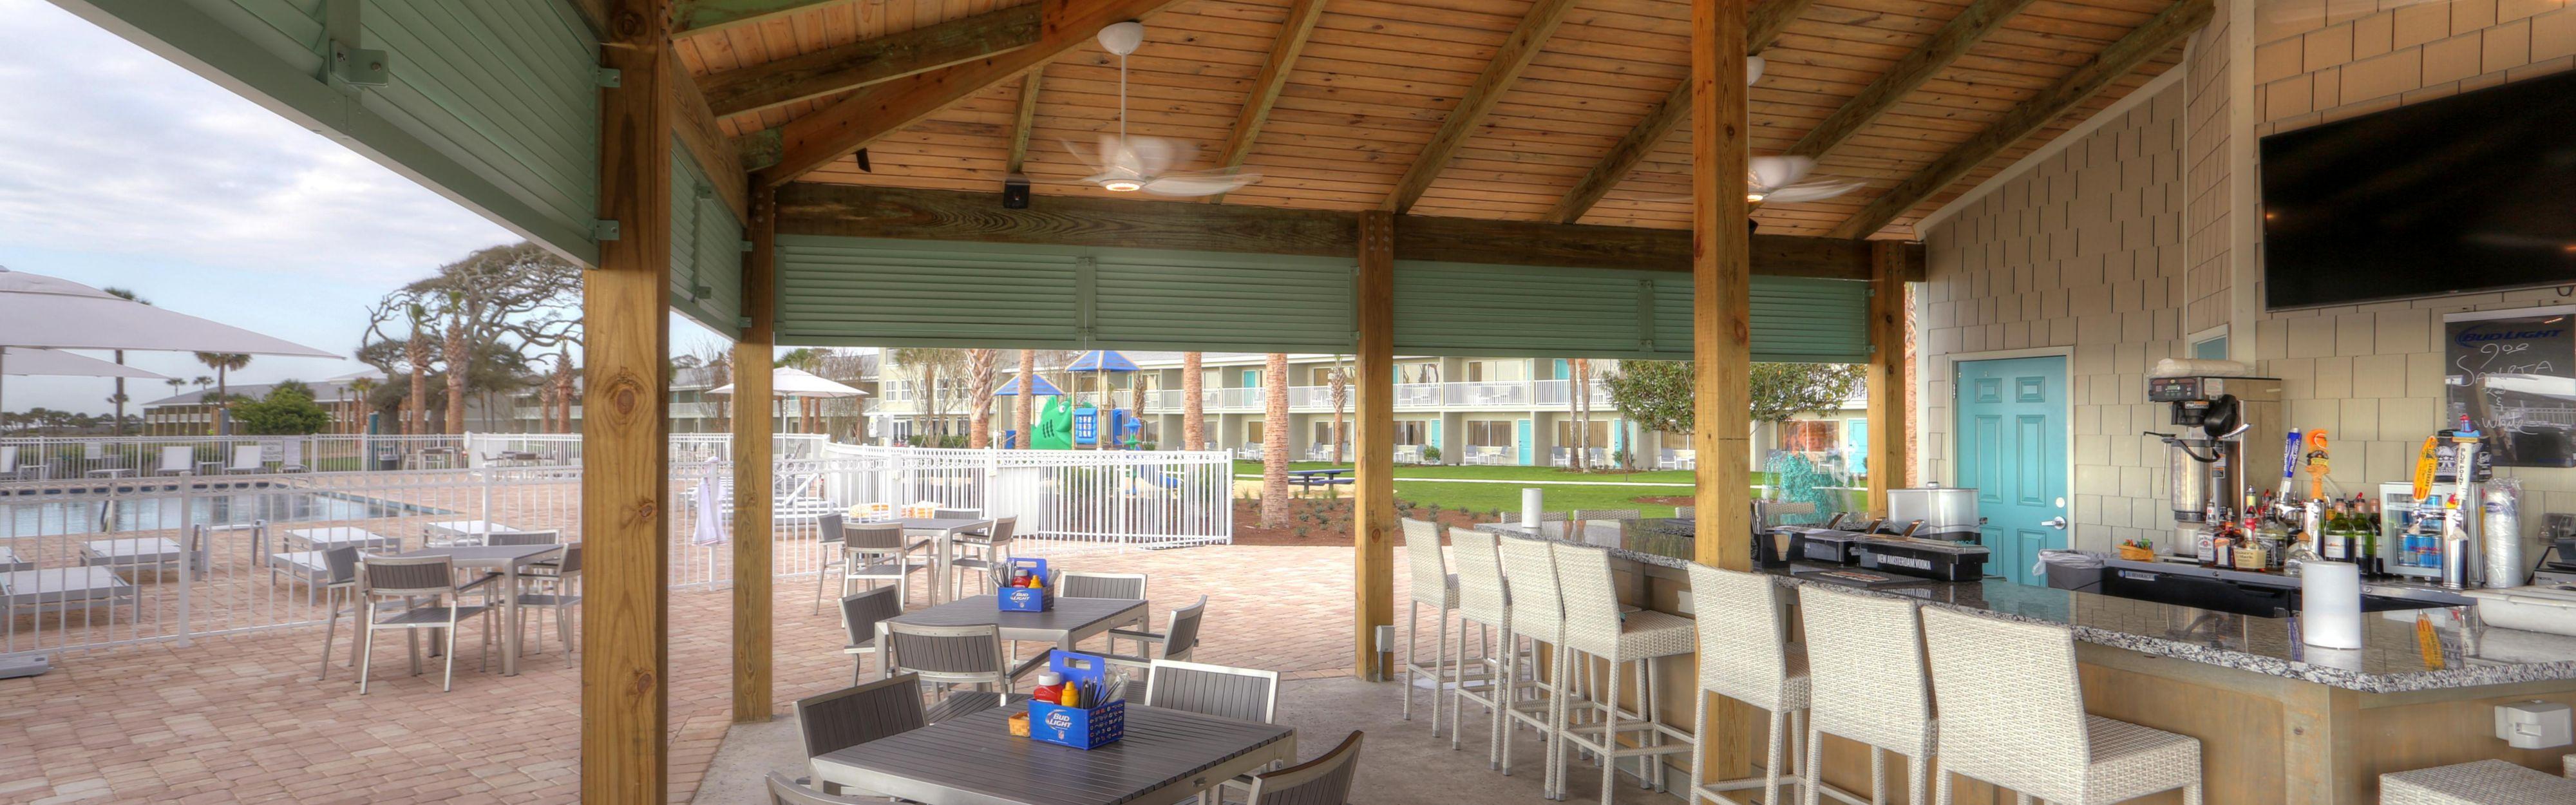 Holiday Inn Resort Jekyll Island image 3